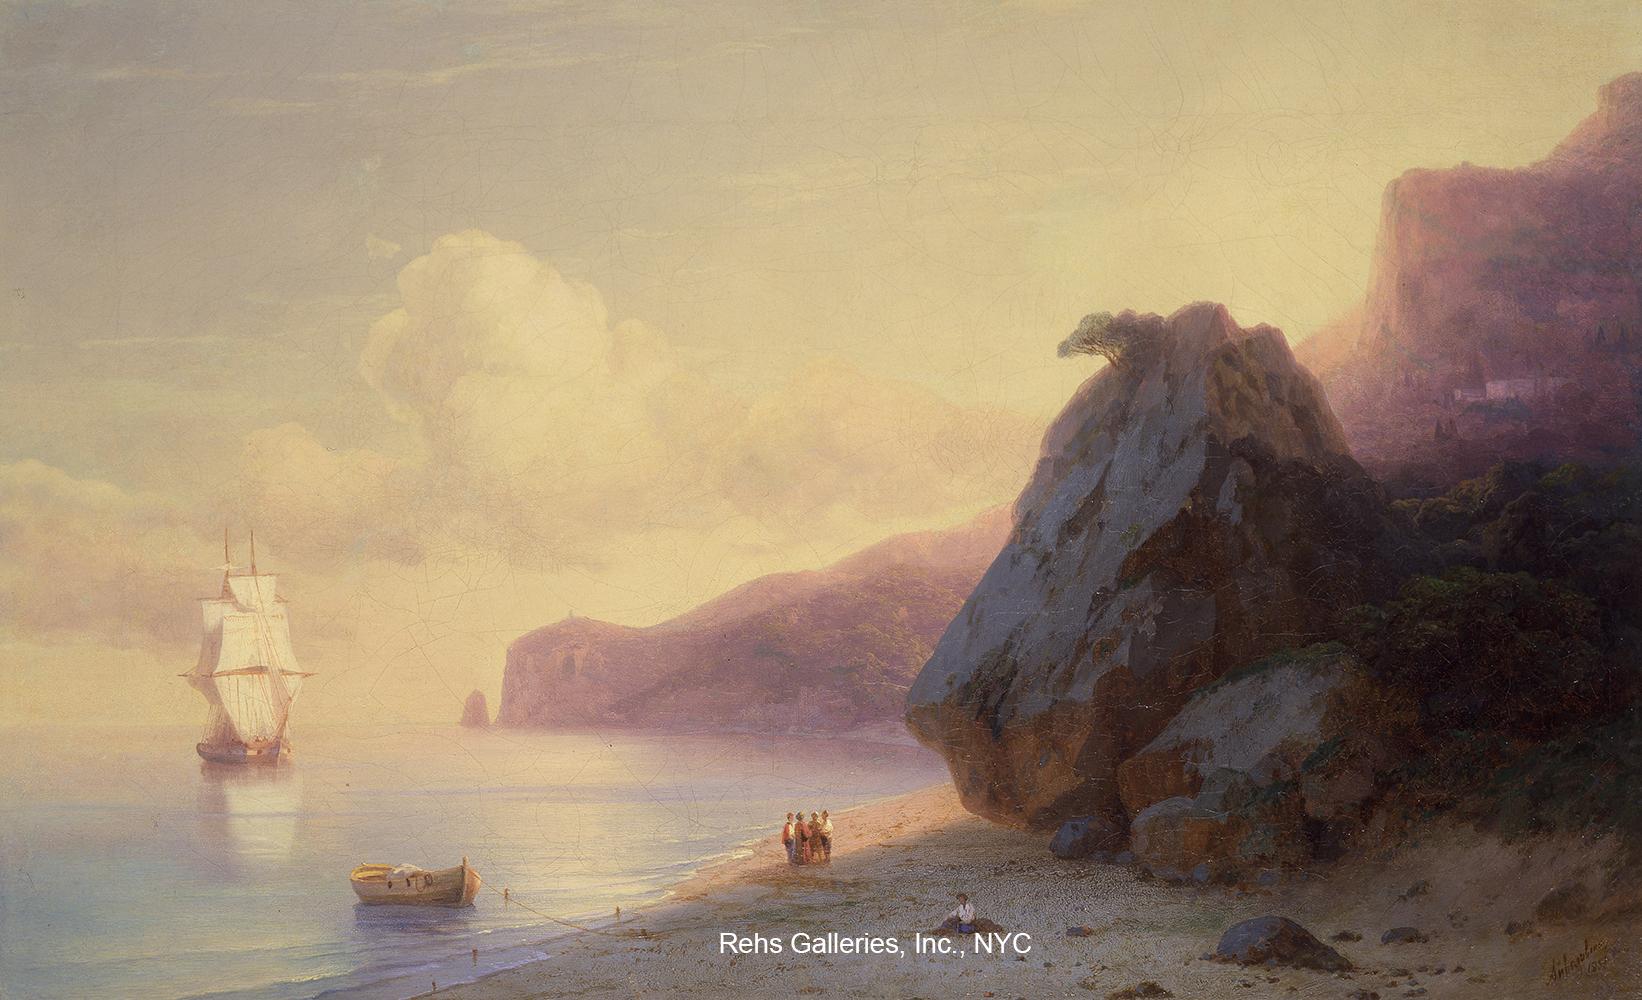 ivan_aivazovsky_a3271_coastal_scene_wm.jpg